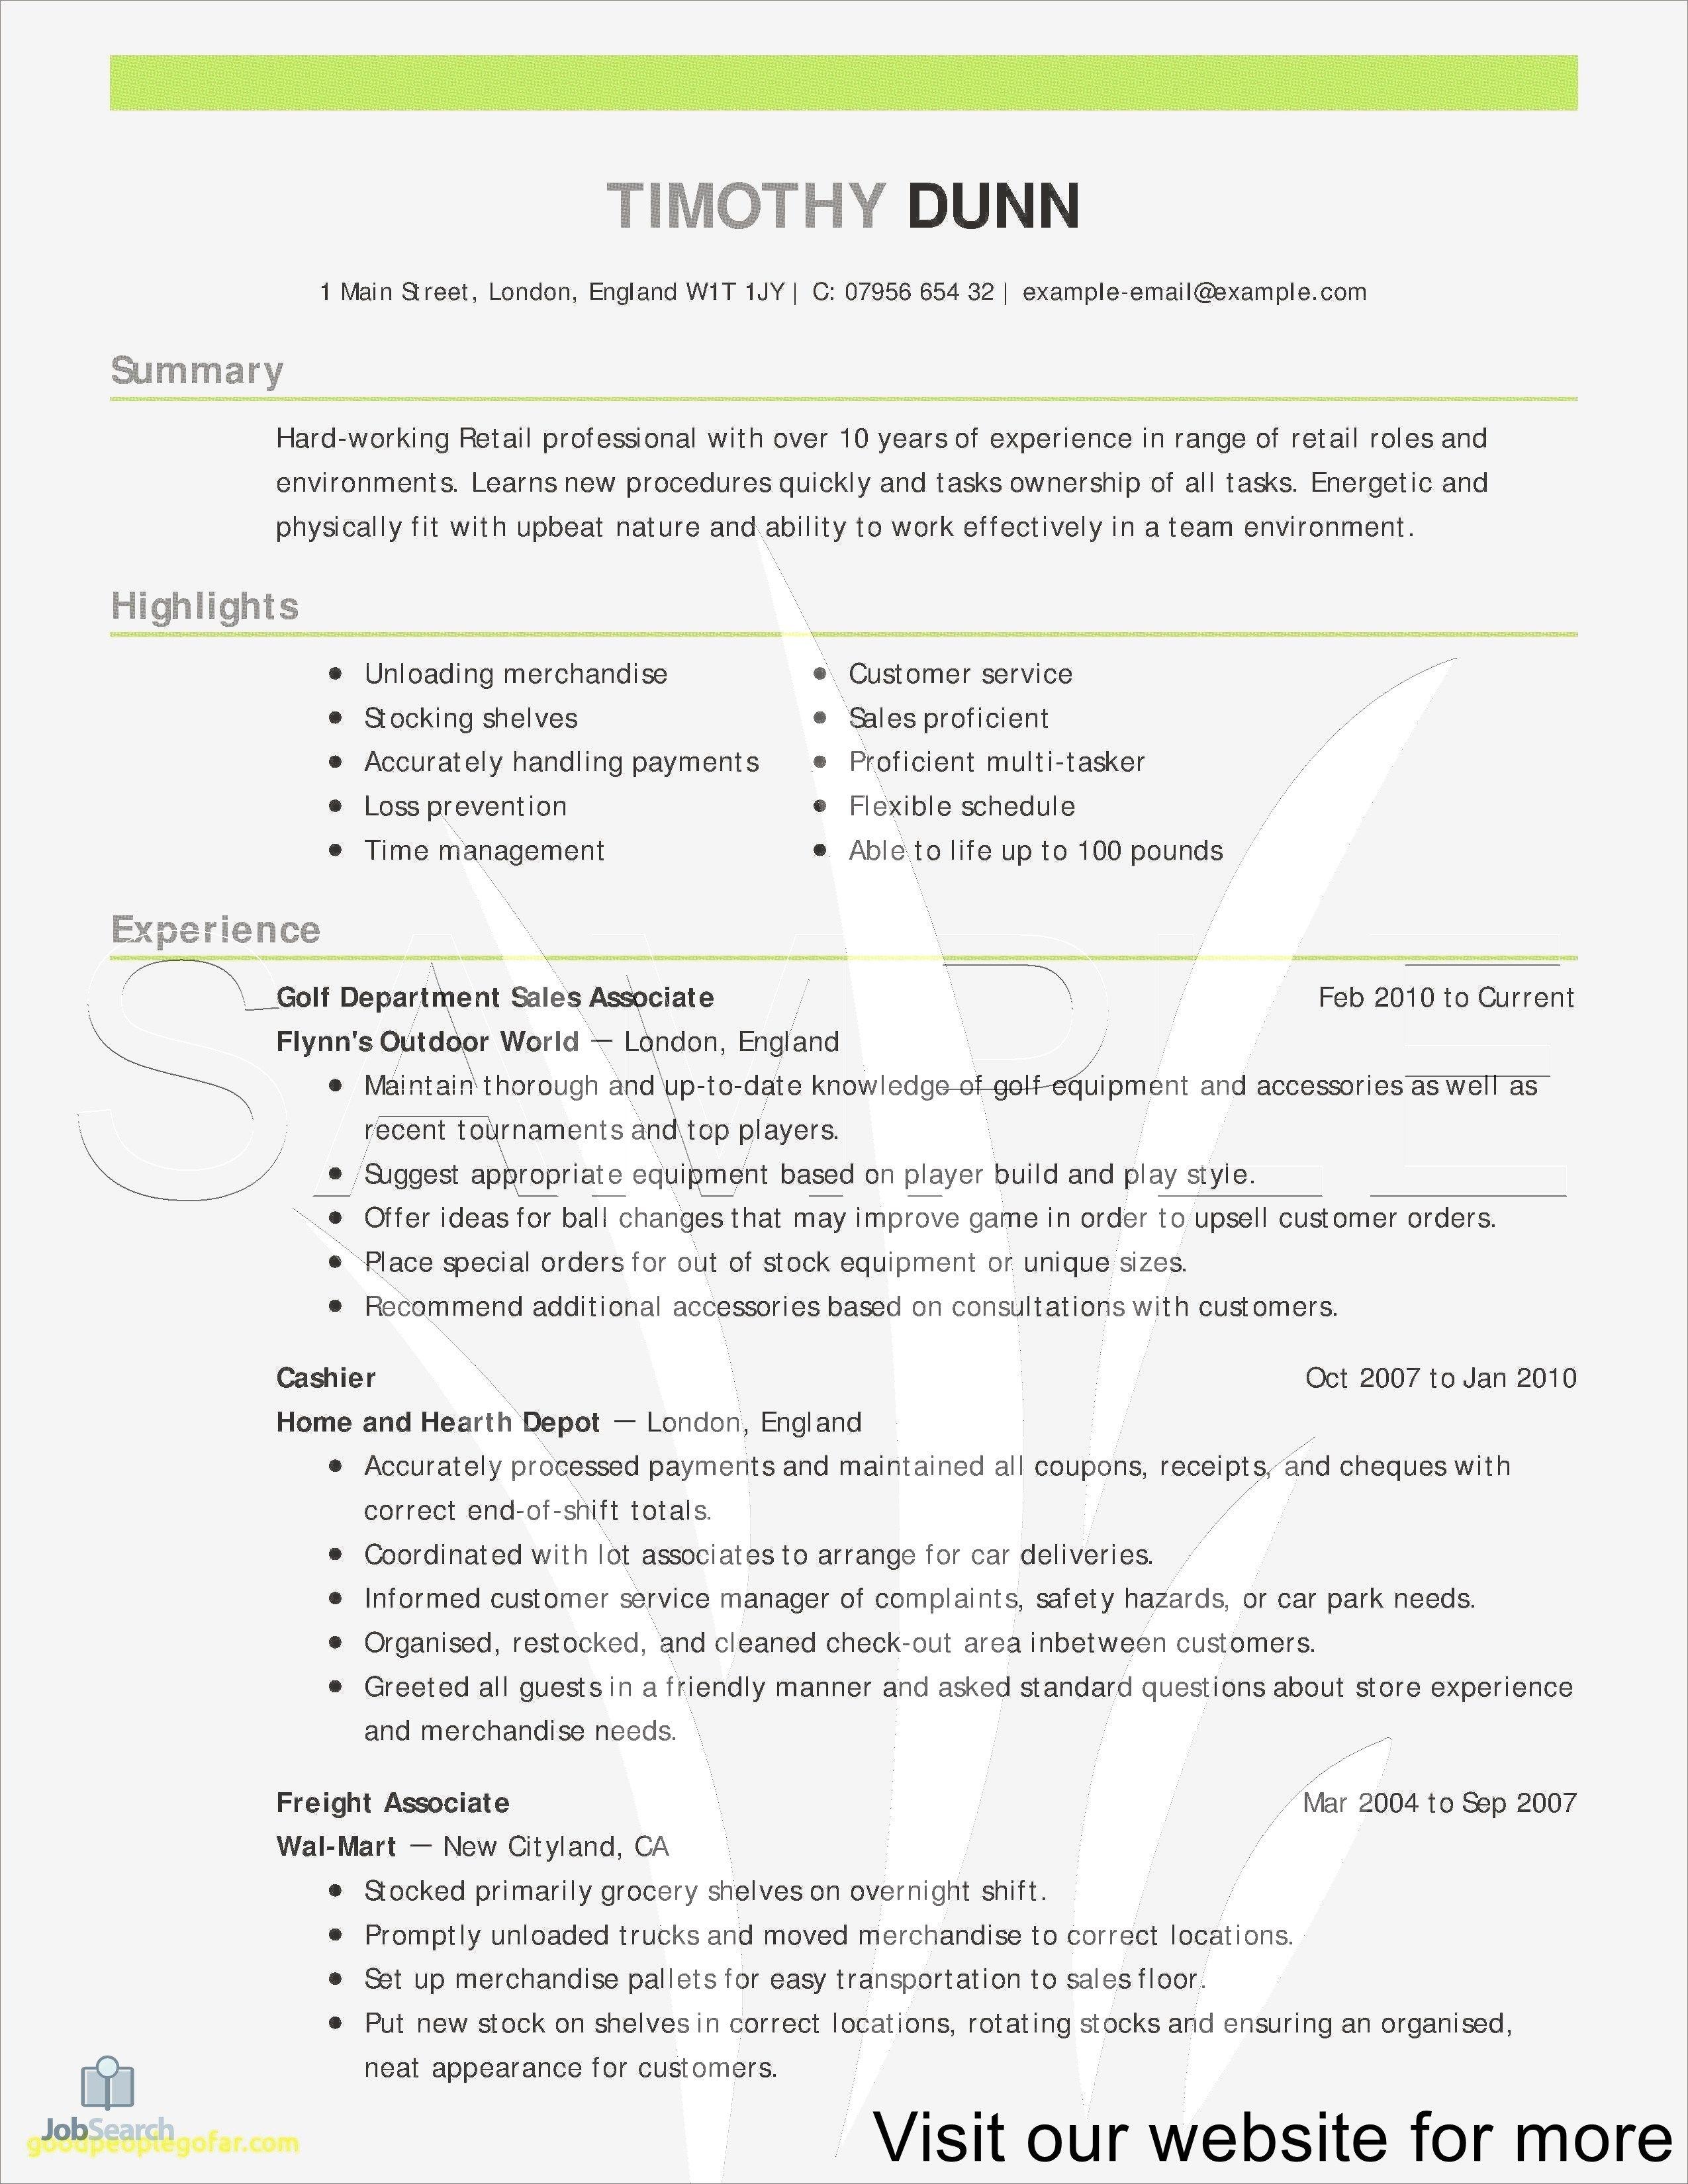 20 Curriculum Vitae Design Cv Template Professional Resume In 2021 Resume Template Australia Resume Template Professional Resume Template